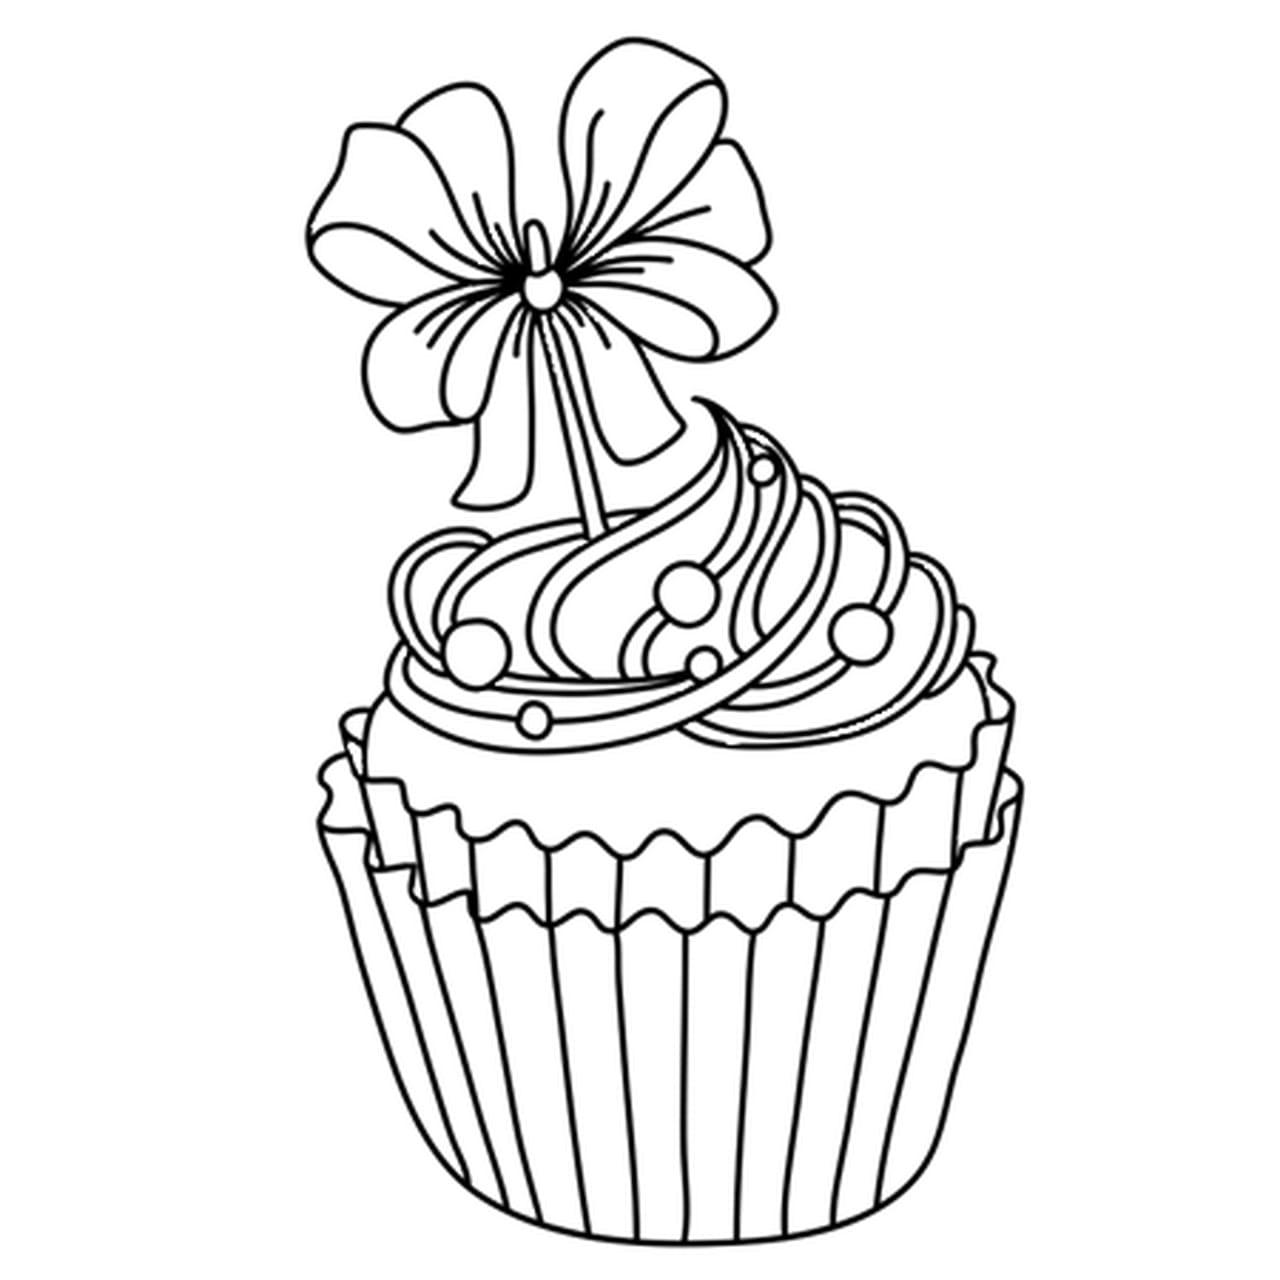 Coloriage Cupcake Adulte A Imprimer.Coloriage Cupcake Festif En Ligne Gratuit A Imprimer